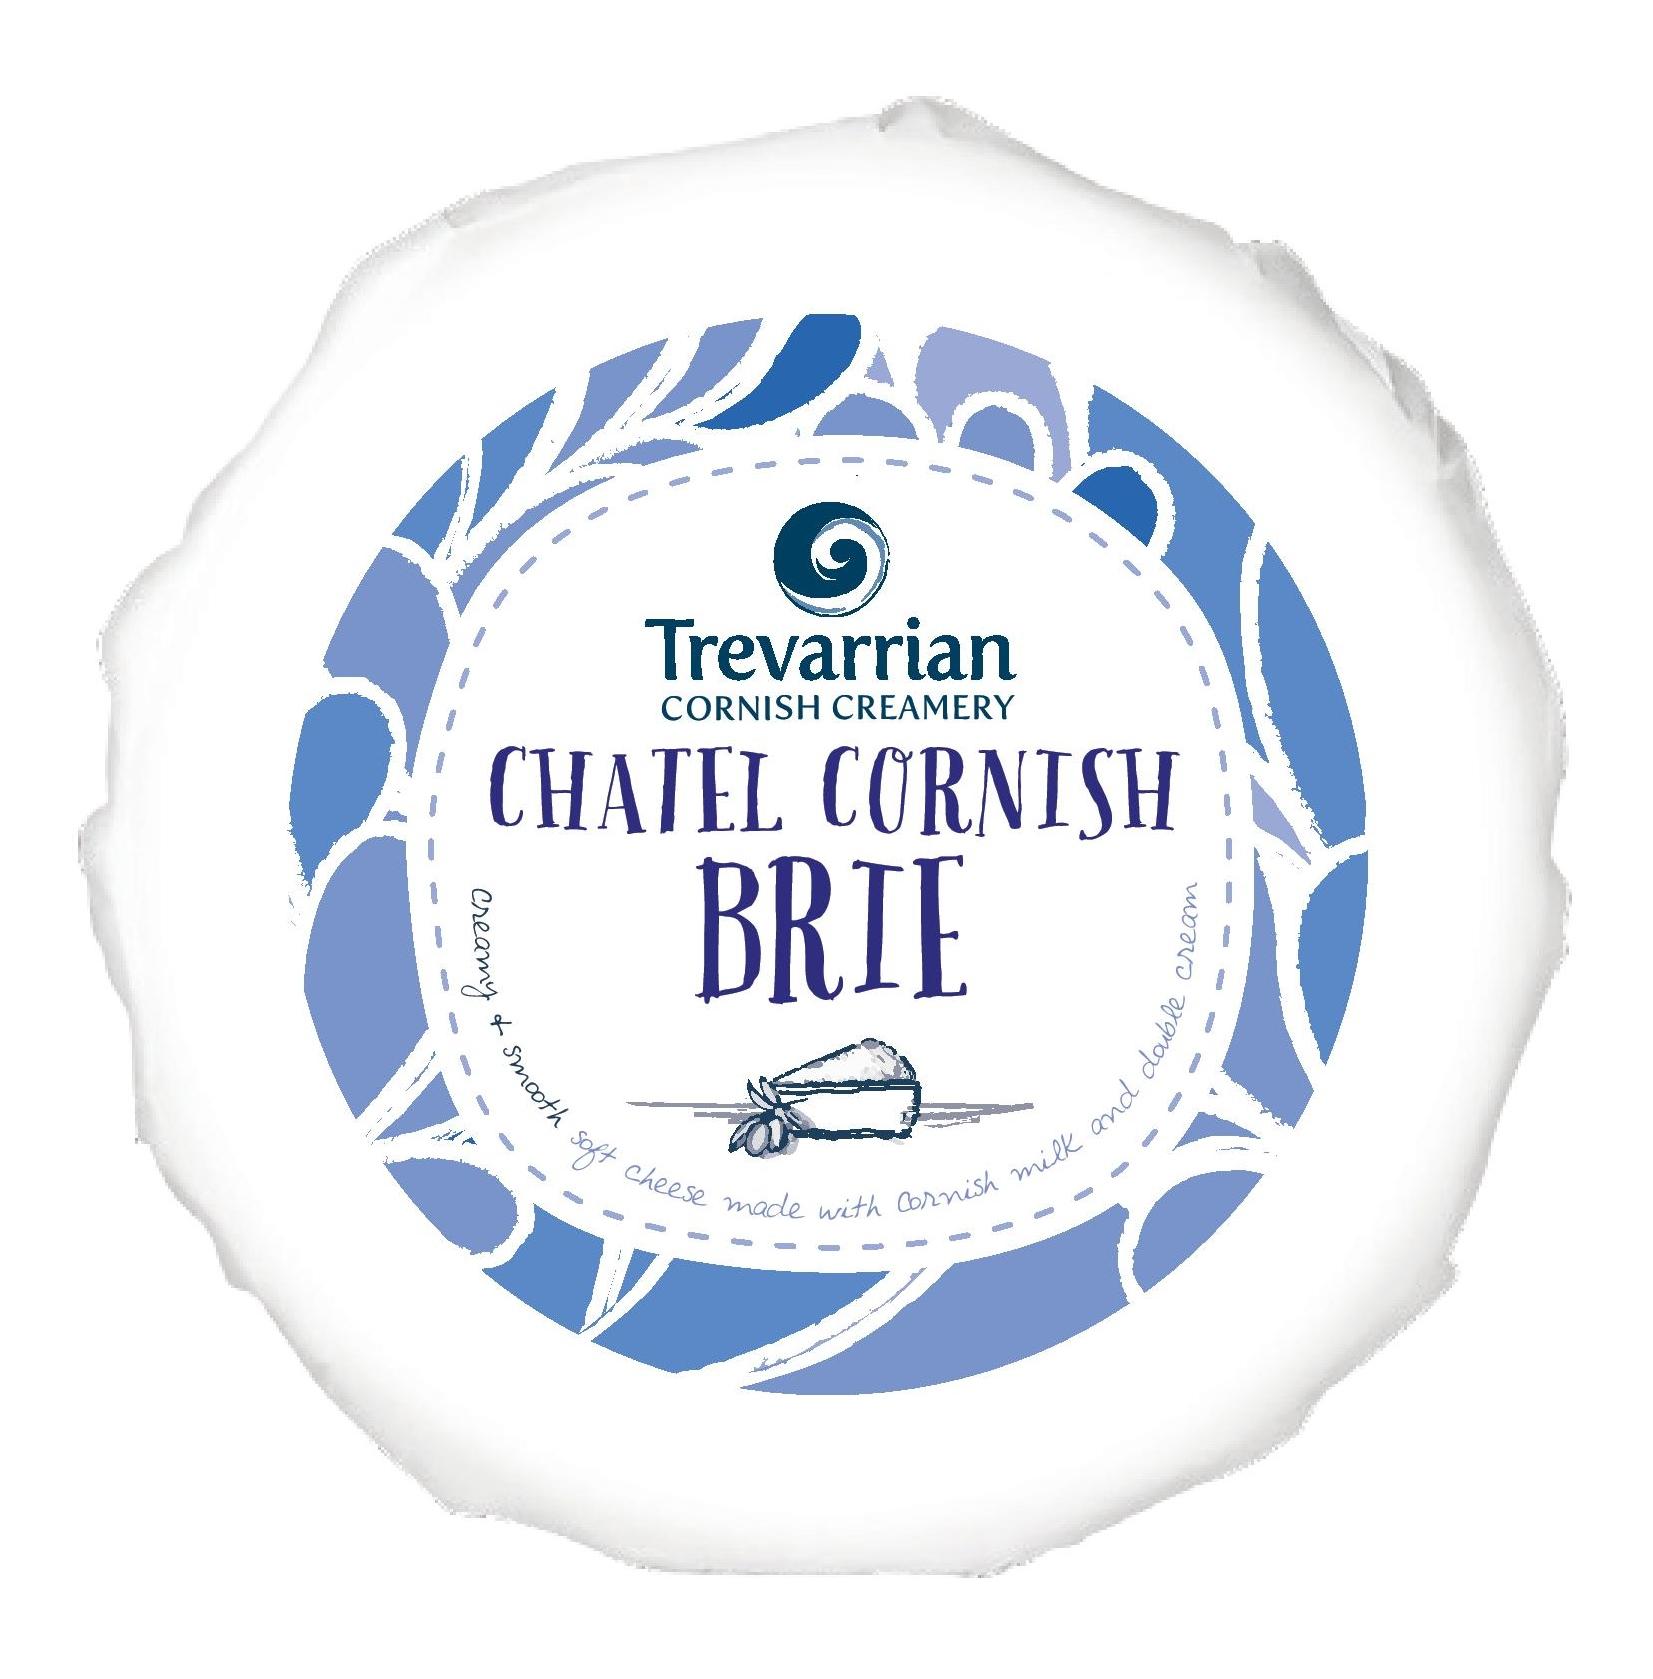 Cornish Brie - 200g